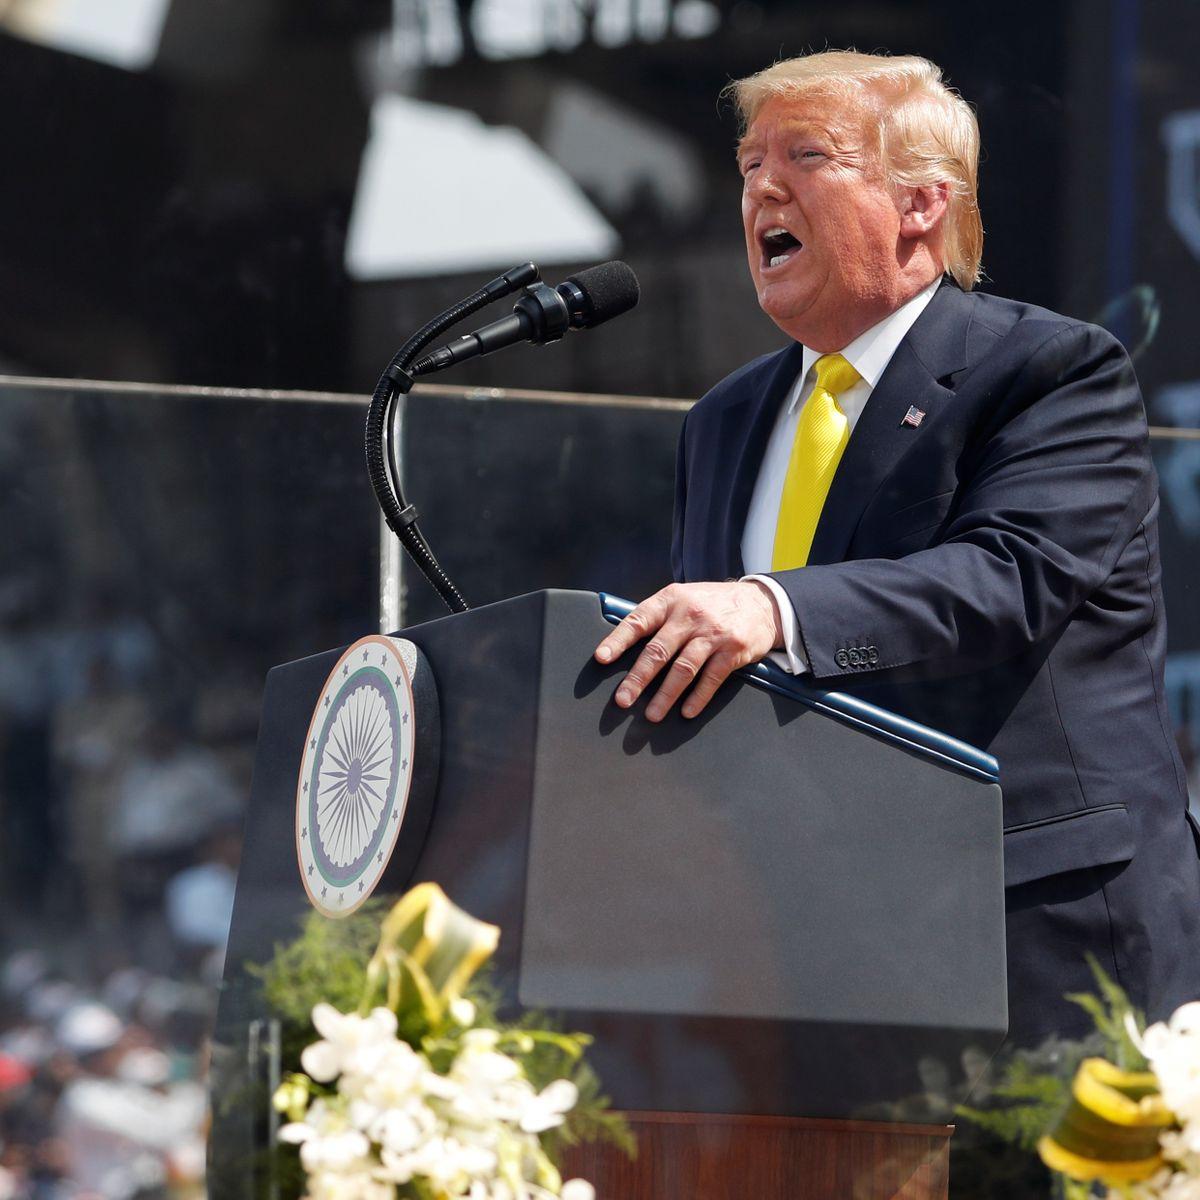 Donald Trump in Indien: Lacher beim Staatsbesuch